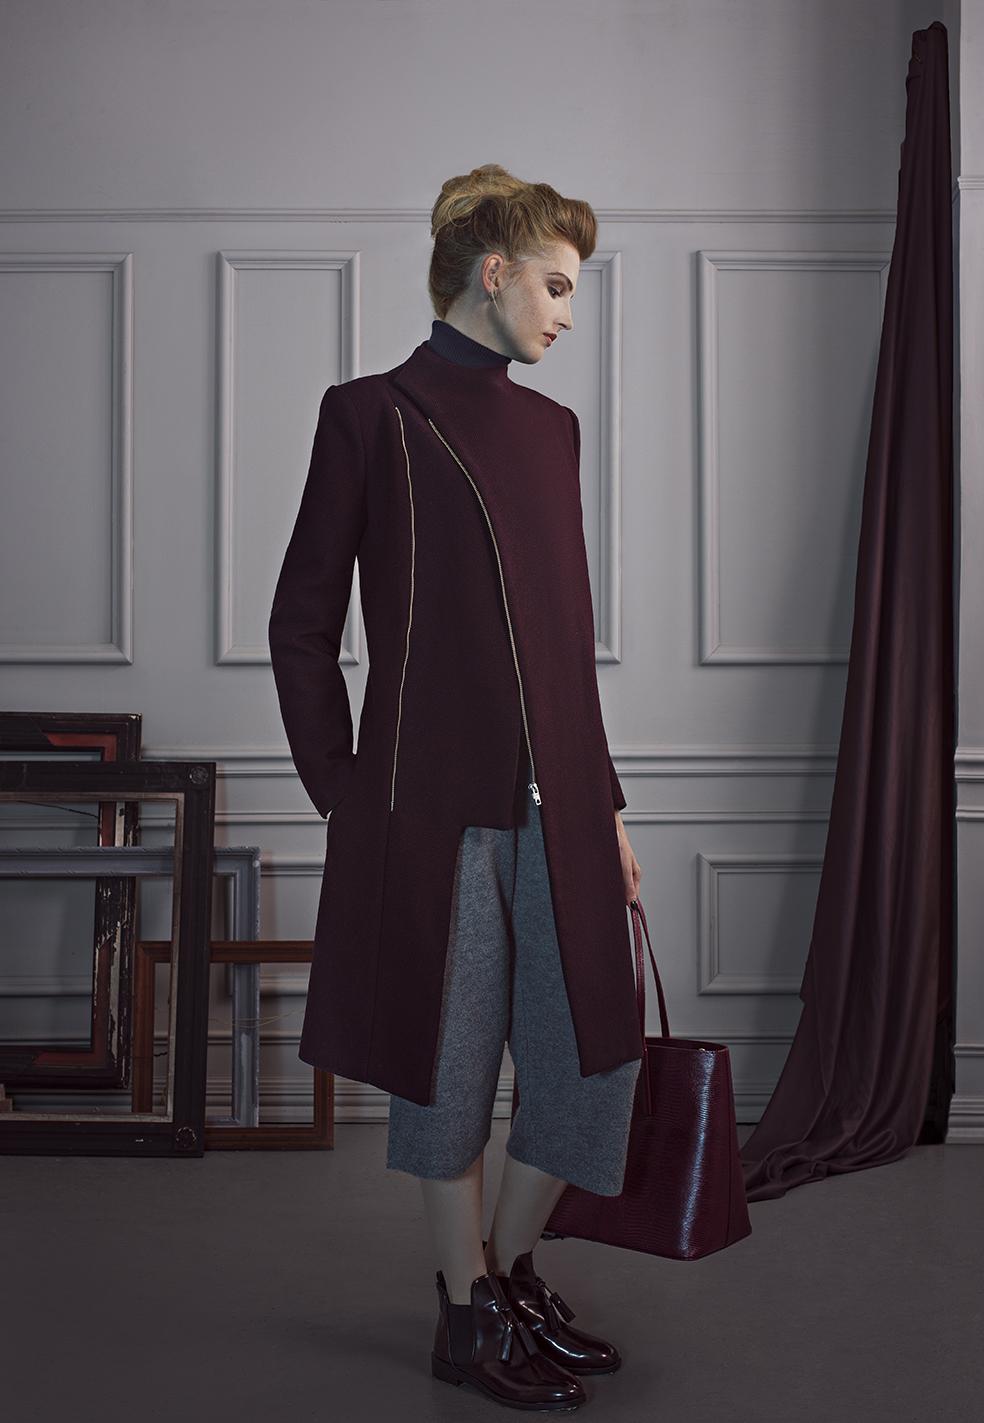 Coat Vielma London, Vest and Cullotes Topshop Unique, Polo neck Next, Shoes Zara, Bag Whistles